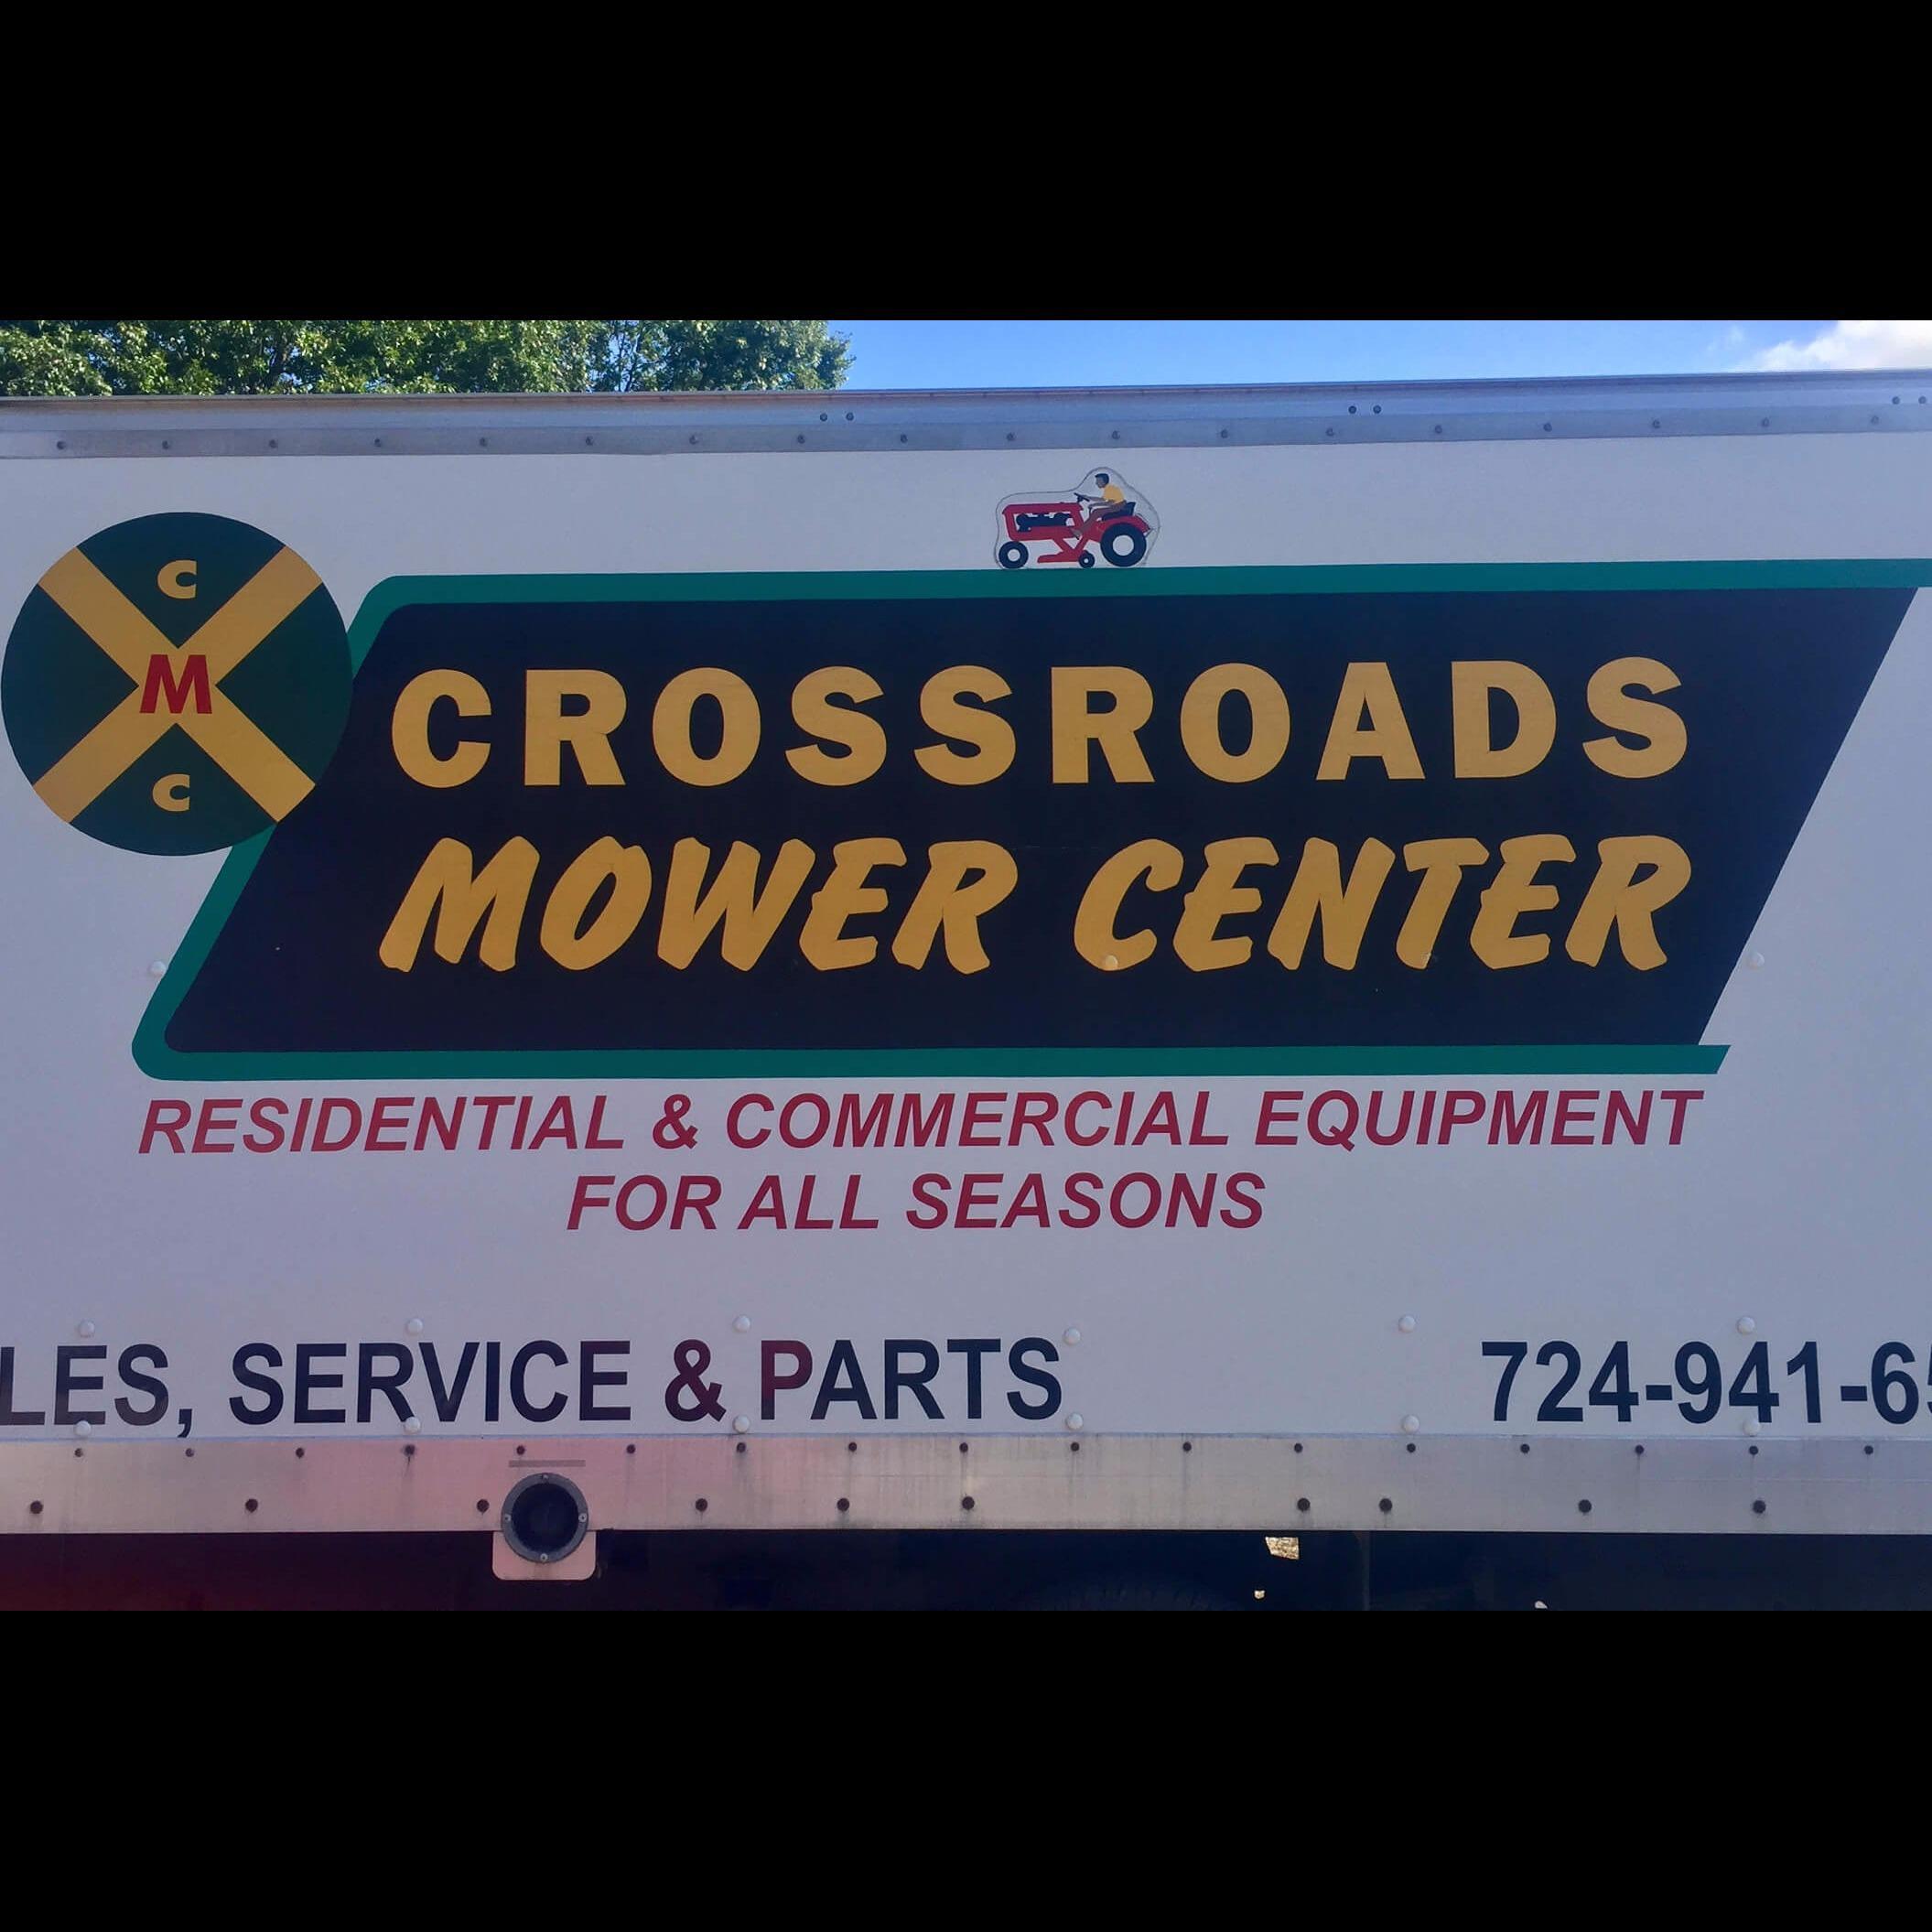 Crossroads Mower Center Mcmurray Pa